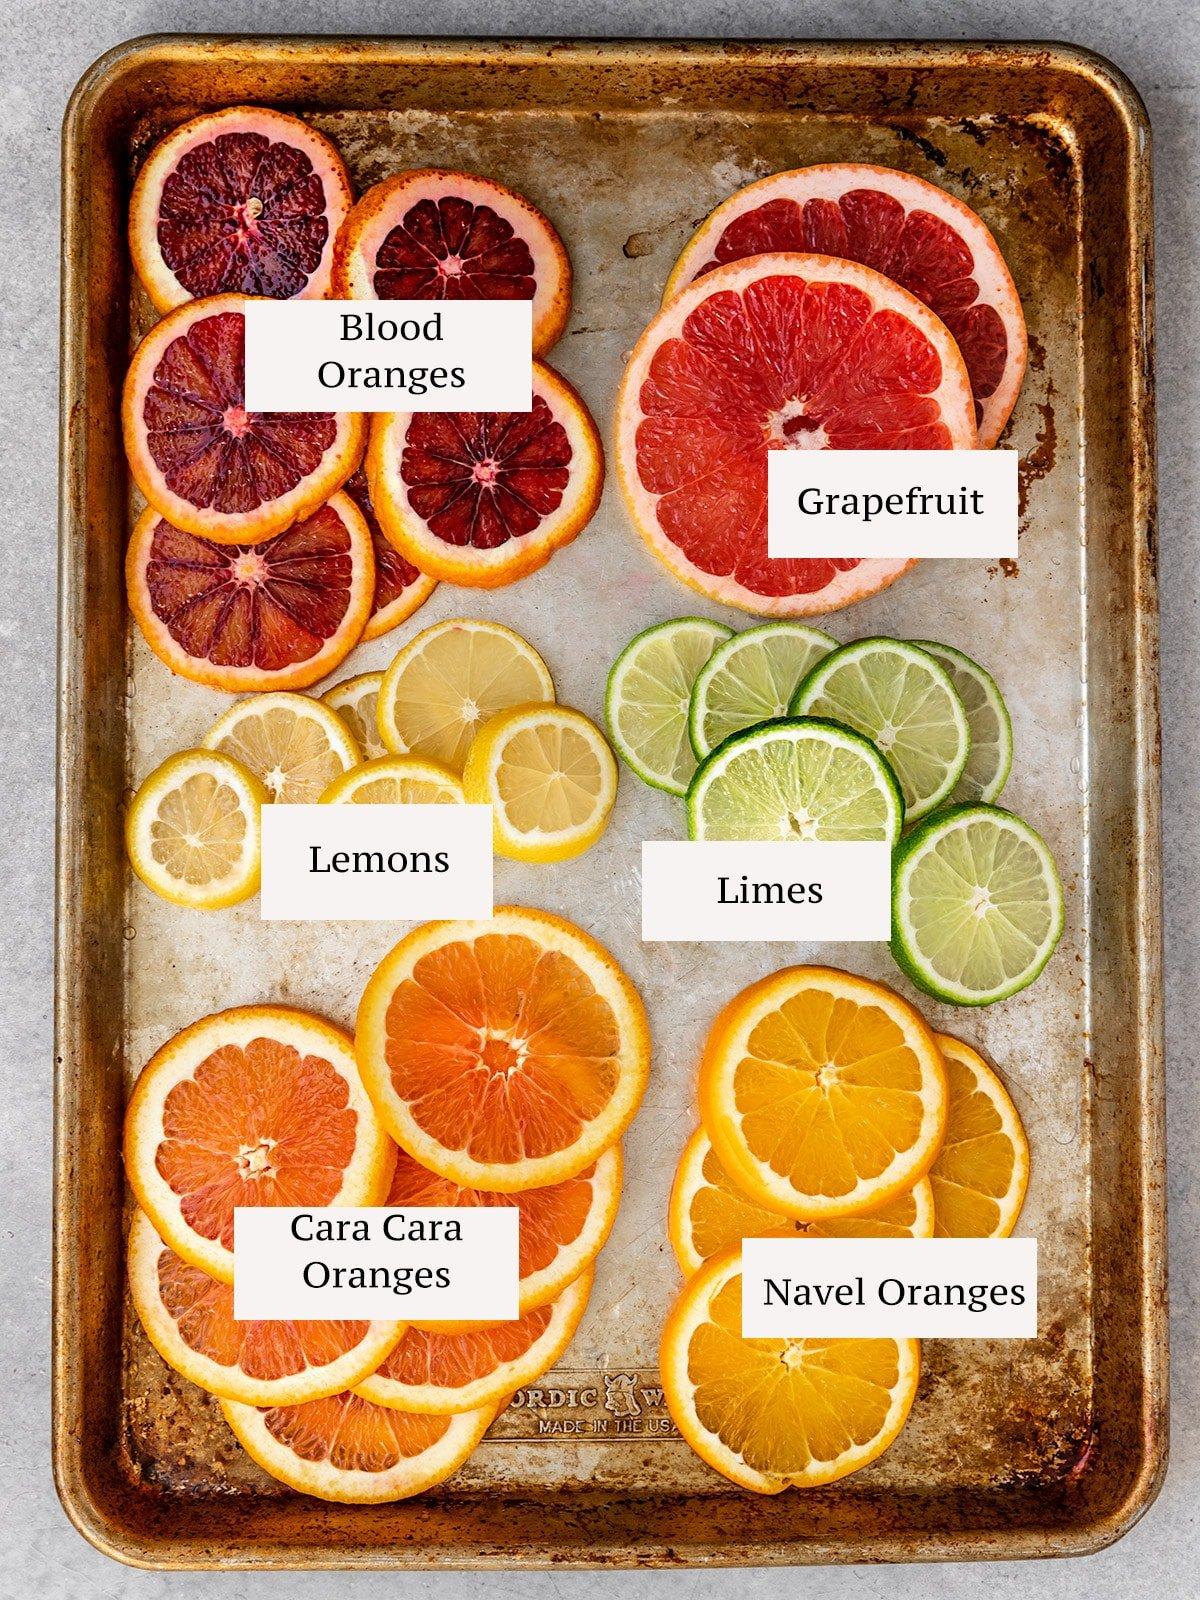 citrus on a baking tray labeled by fruit including blood oranges, grapefruit, lemons, limes, cara cara oranges, and navel oranges